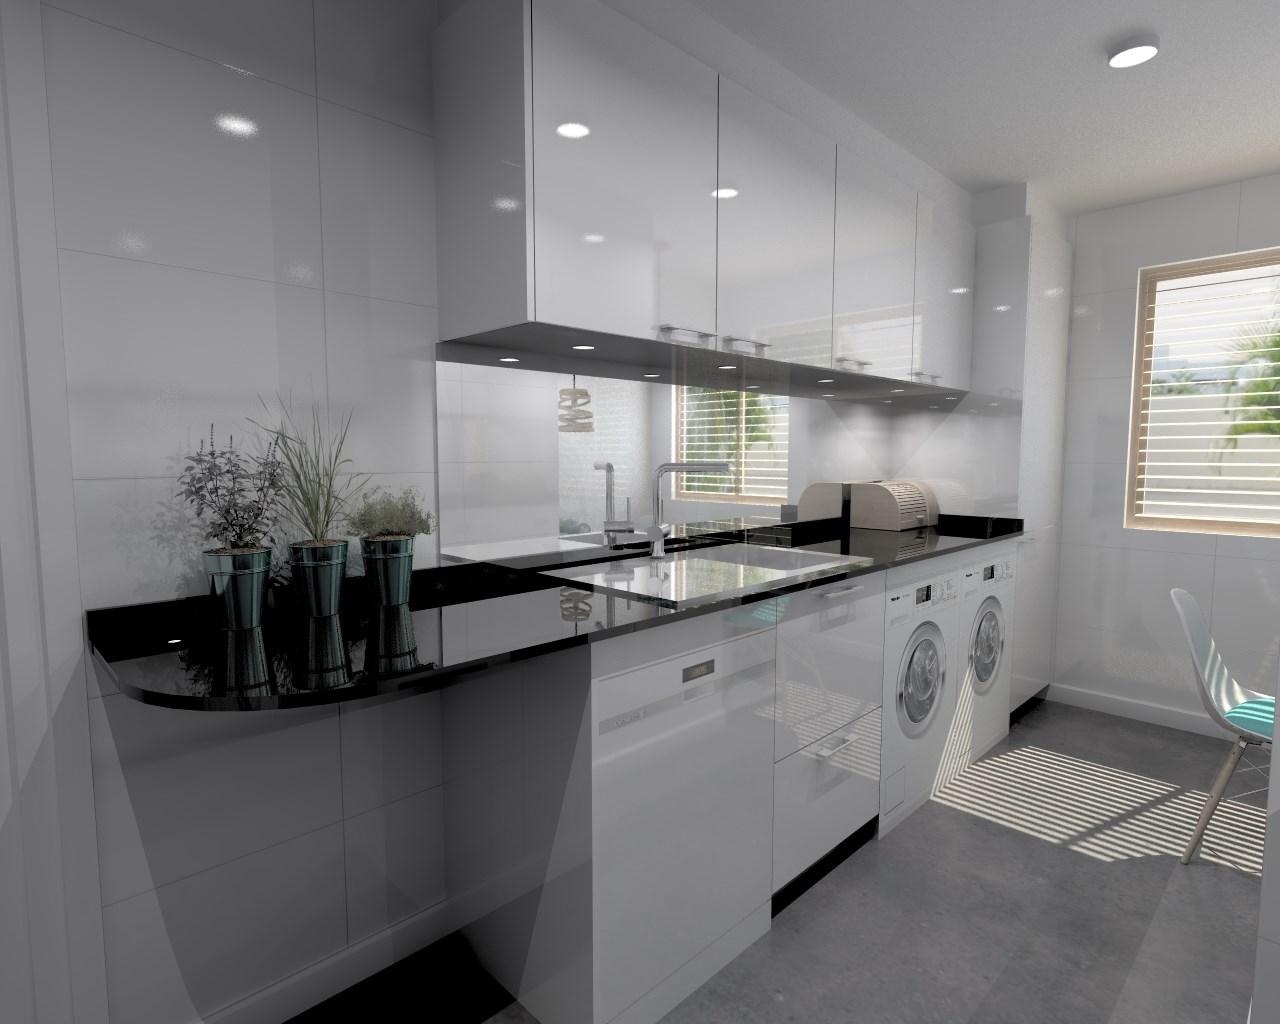 Aravaca cocina santos modelo plano laminado blanco for Cocina negra ikea